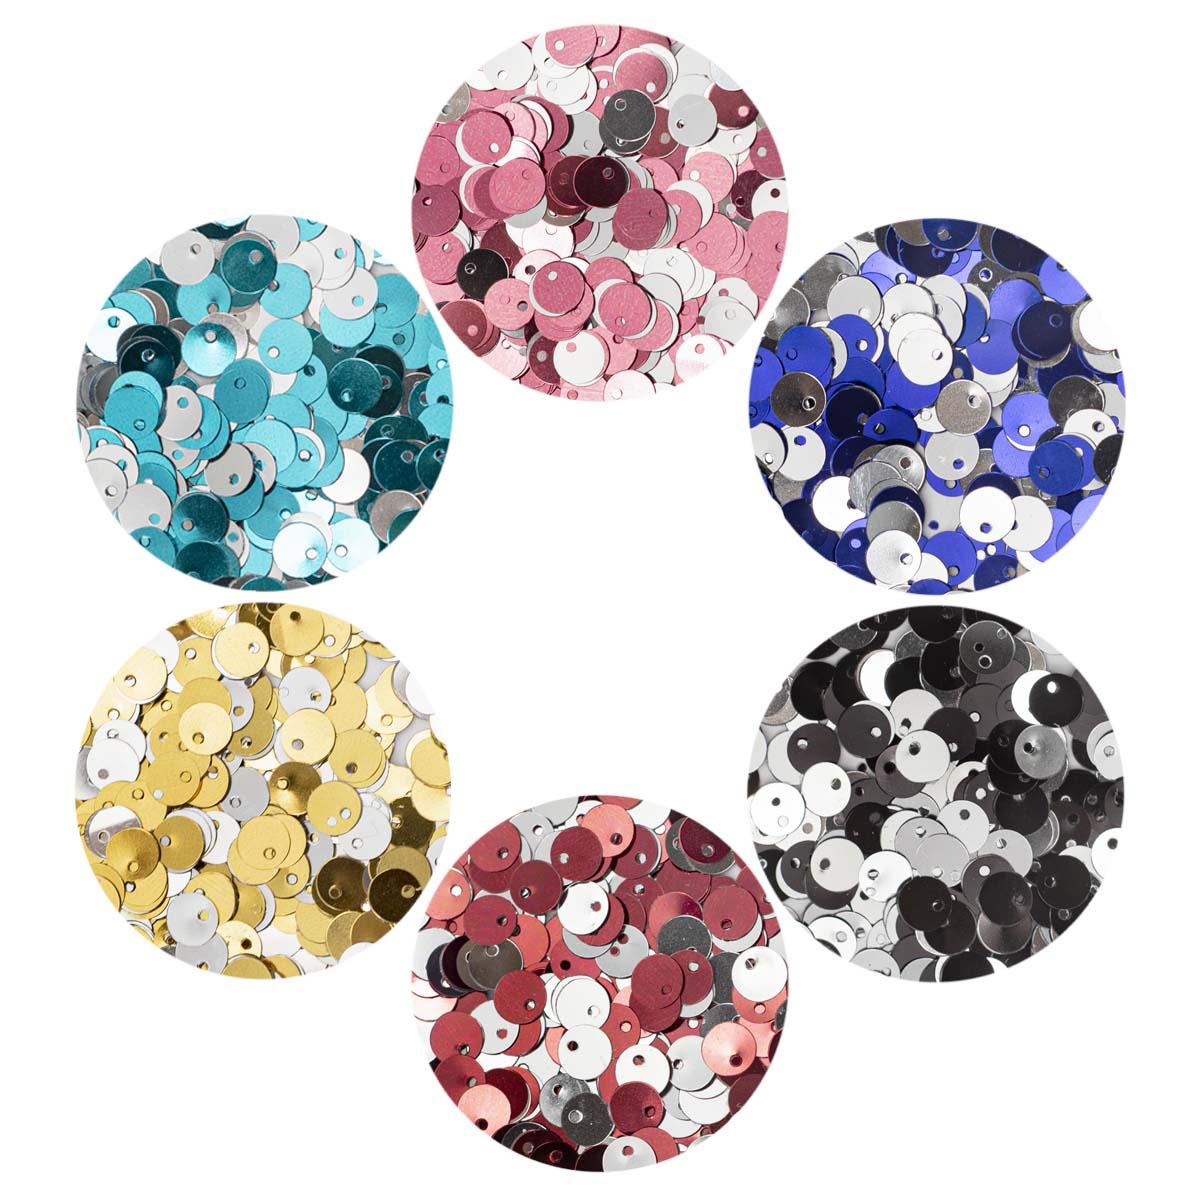 Набор серебристых двусторонних пайеток 6мм, 6 цветов по 10гр, Астра